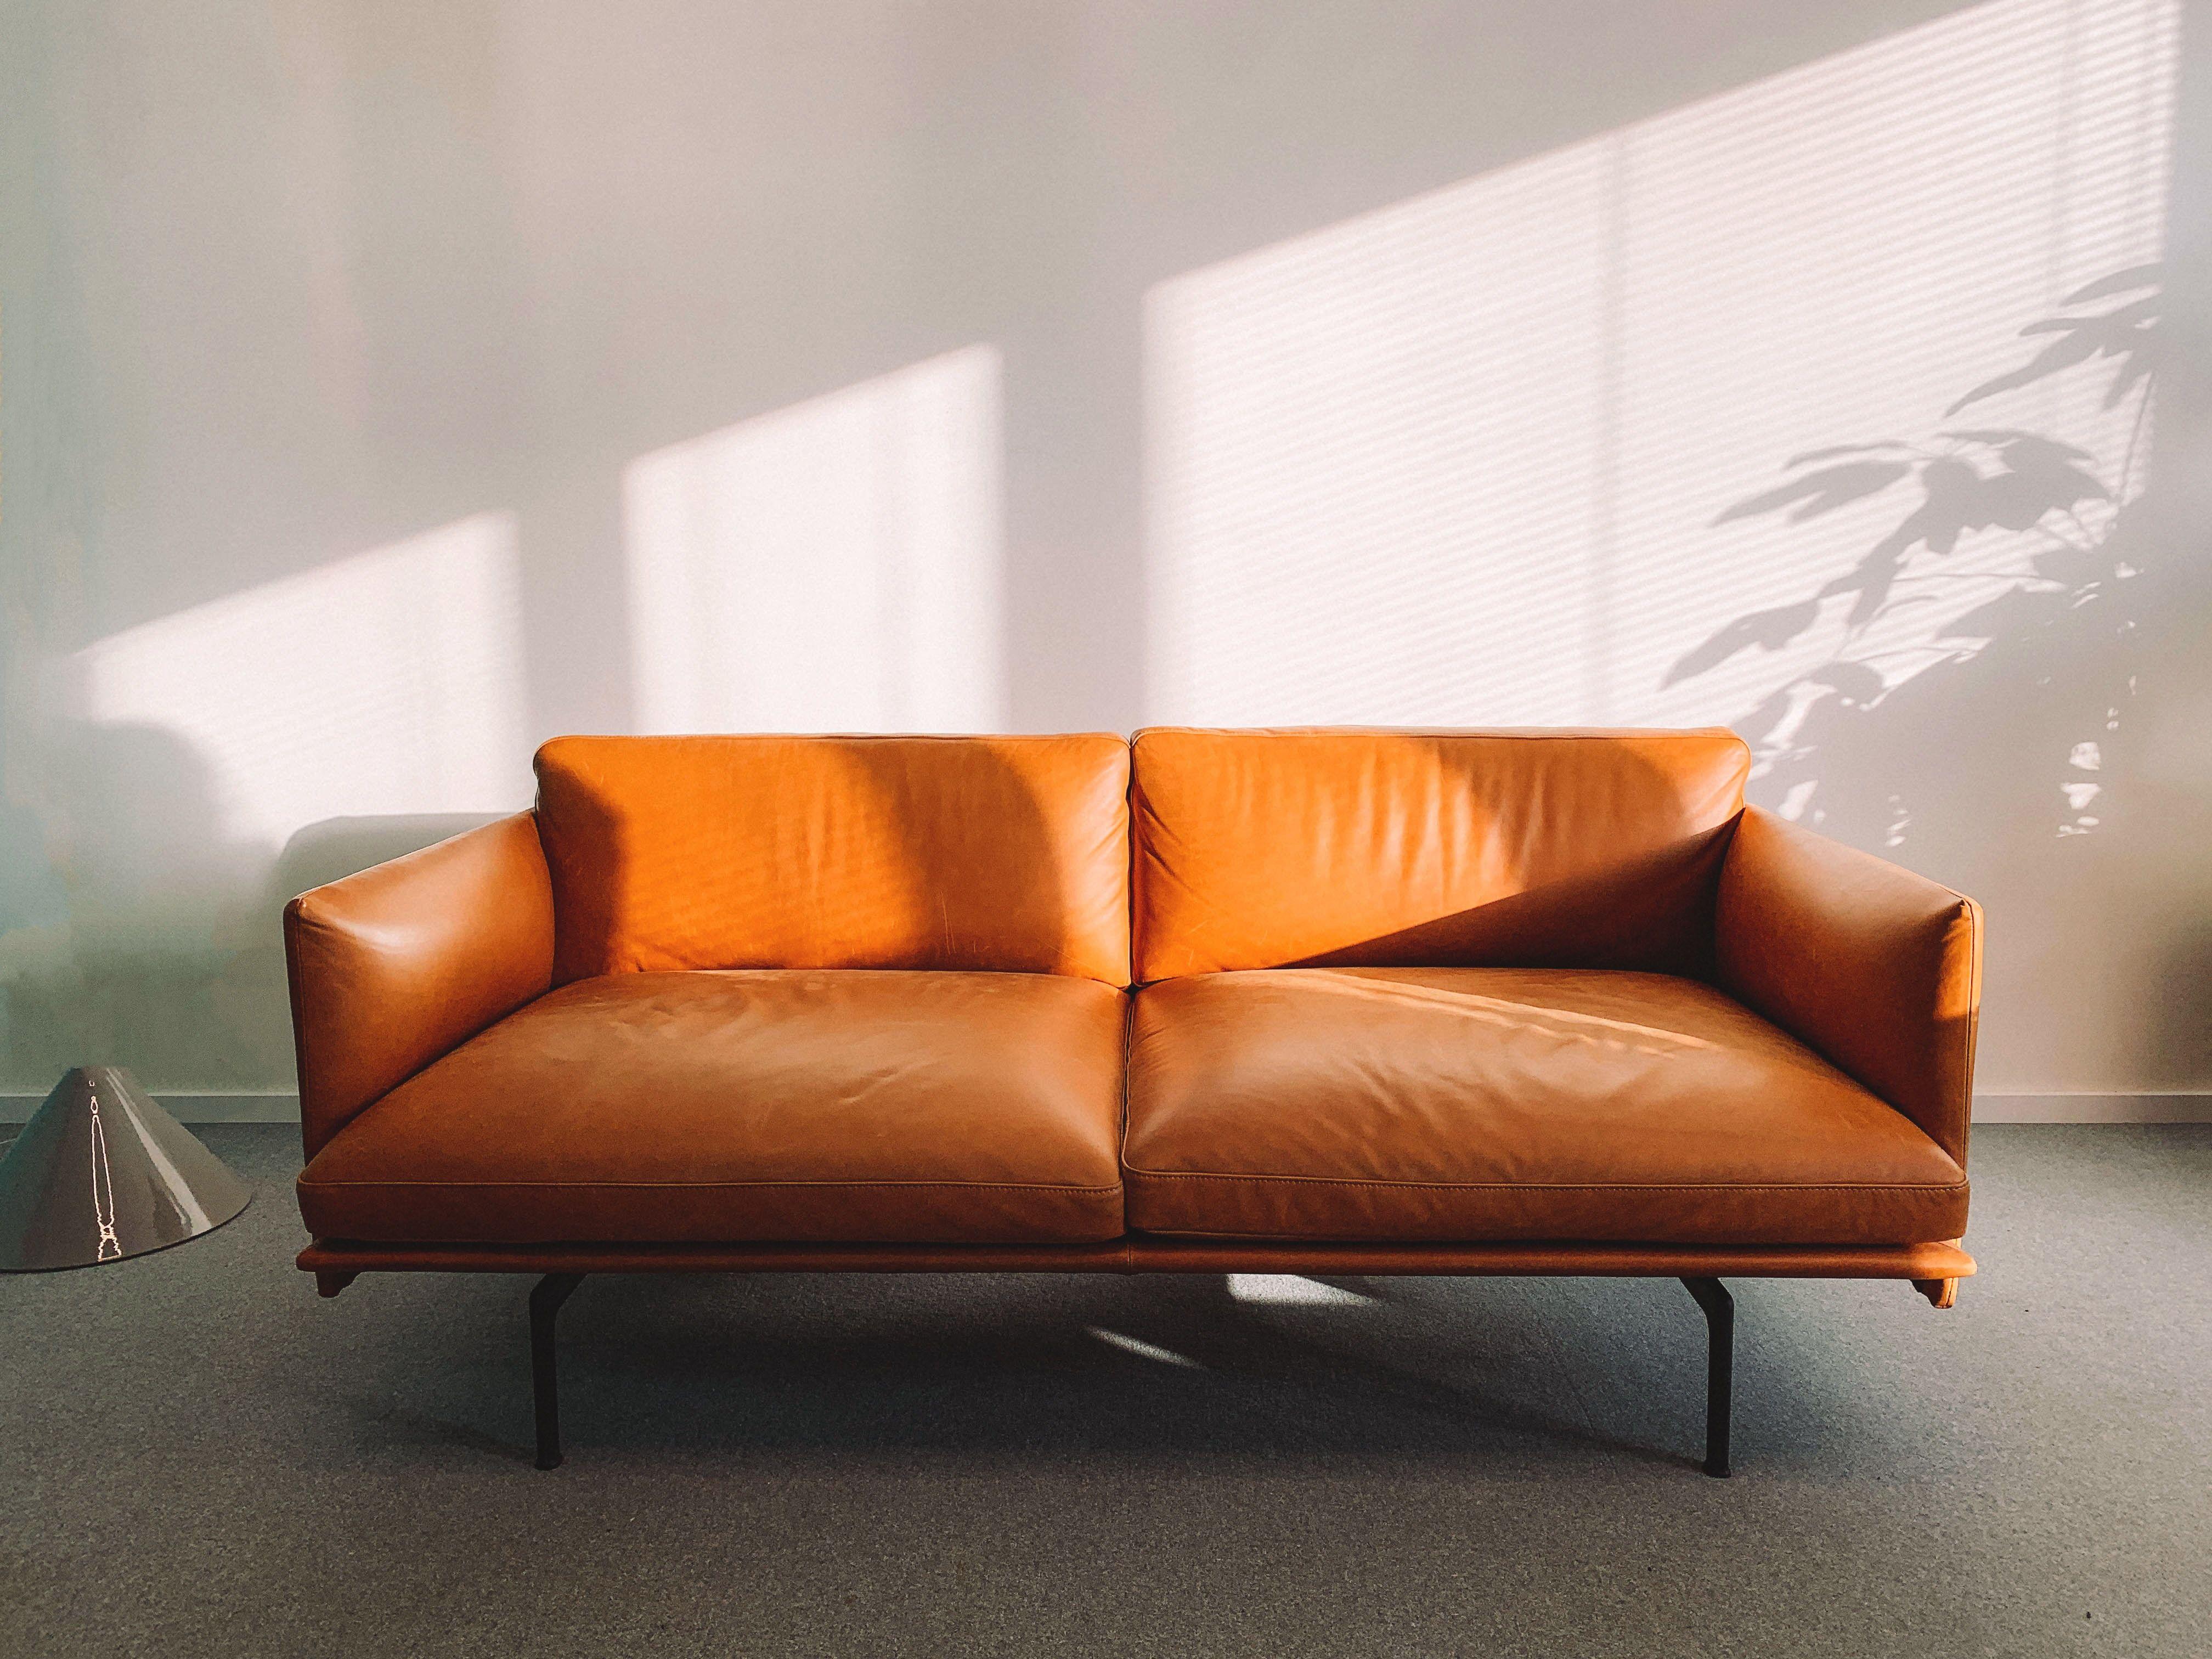 Splendido Contemporary Sofa Orange Leather Sofas Living Room Decor Modern Leather Sofa